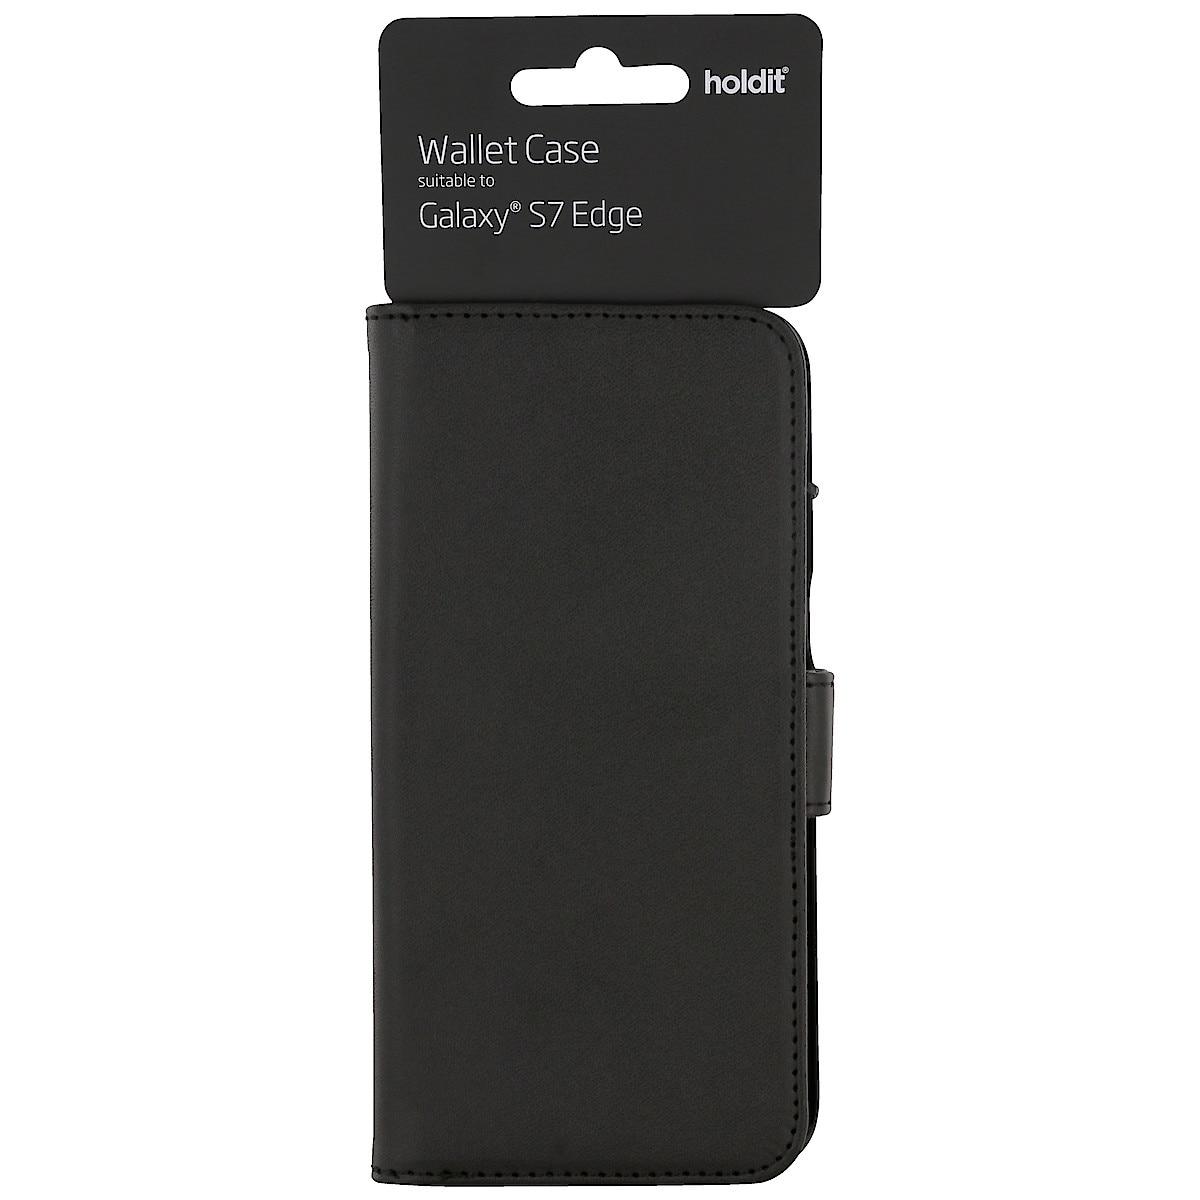 Plånboksfodral för Samsung Galaxy S7 Edge, Holdit